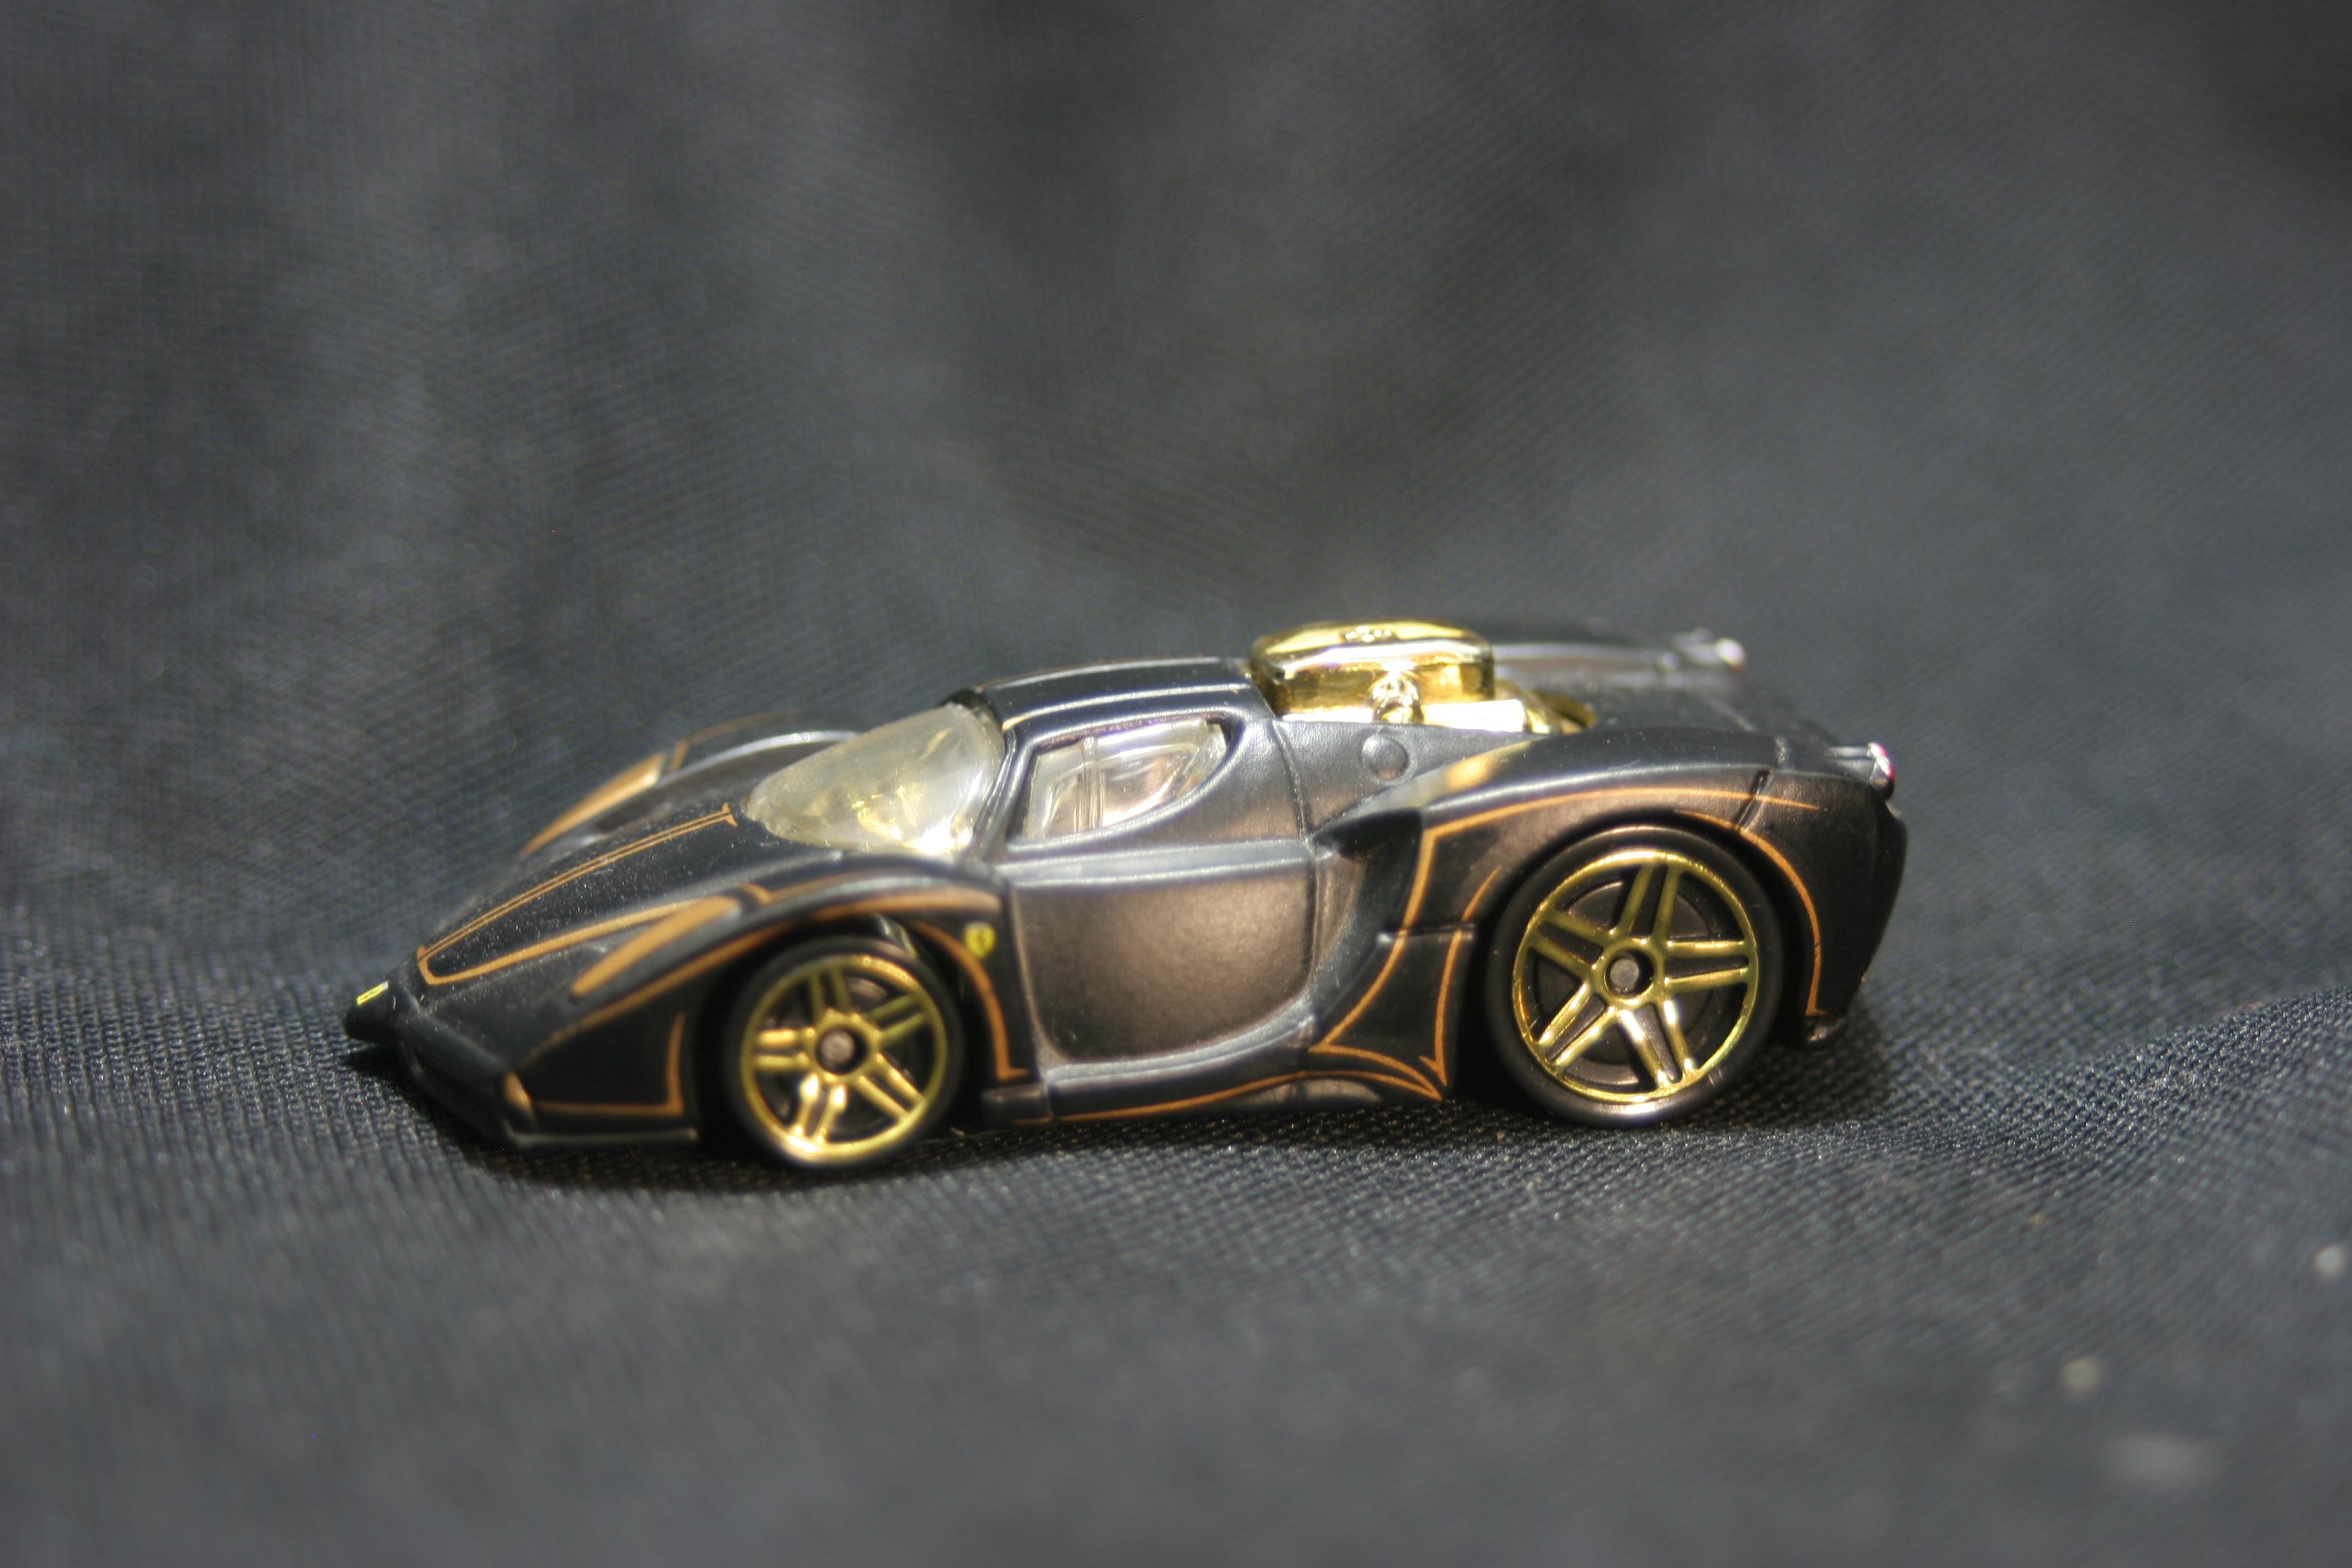 Enzo Ferrari ('Tooned)